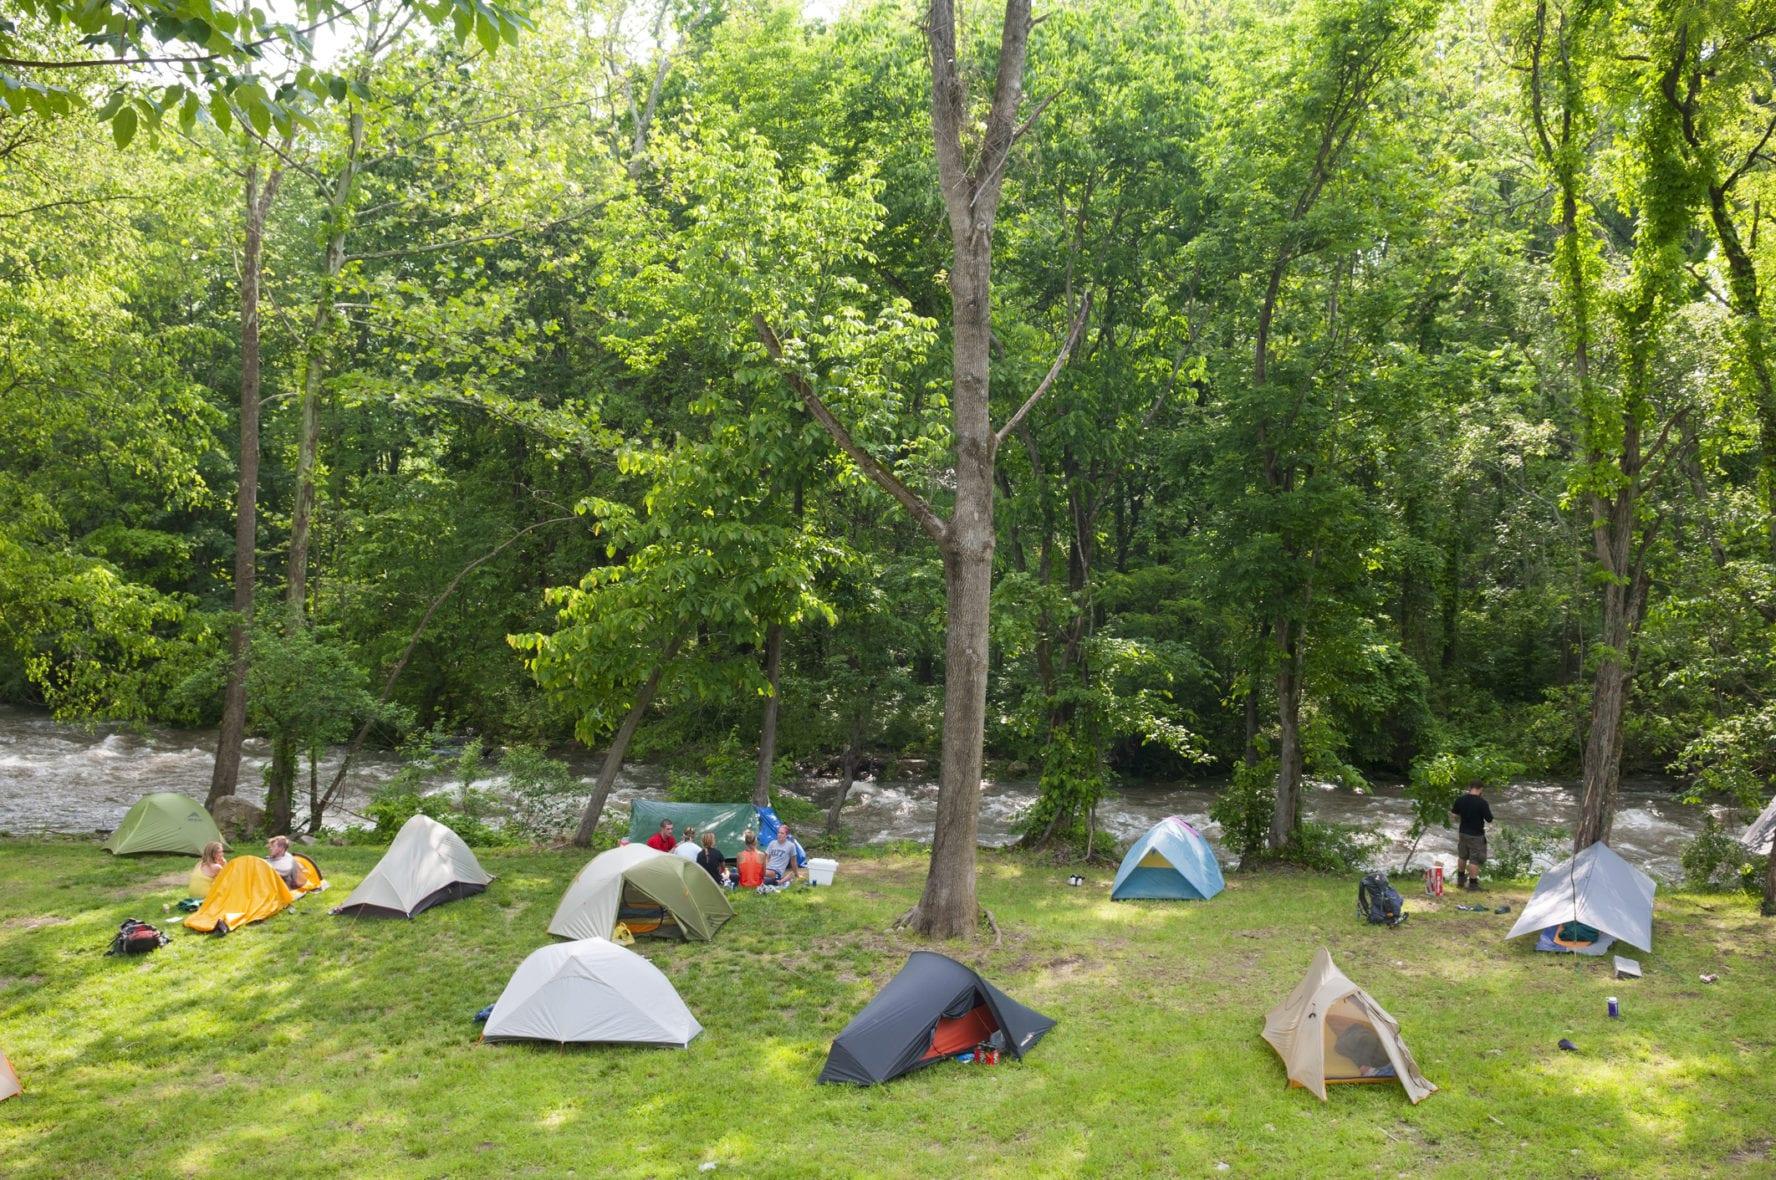 Appalachian Trail camping